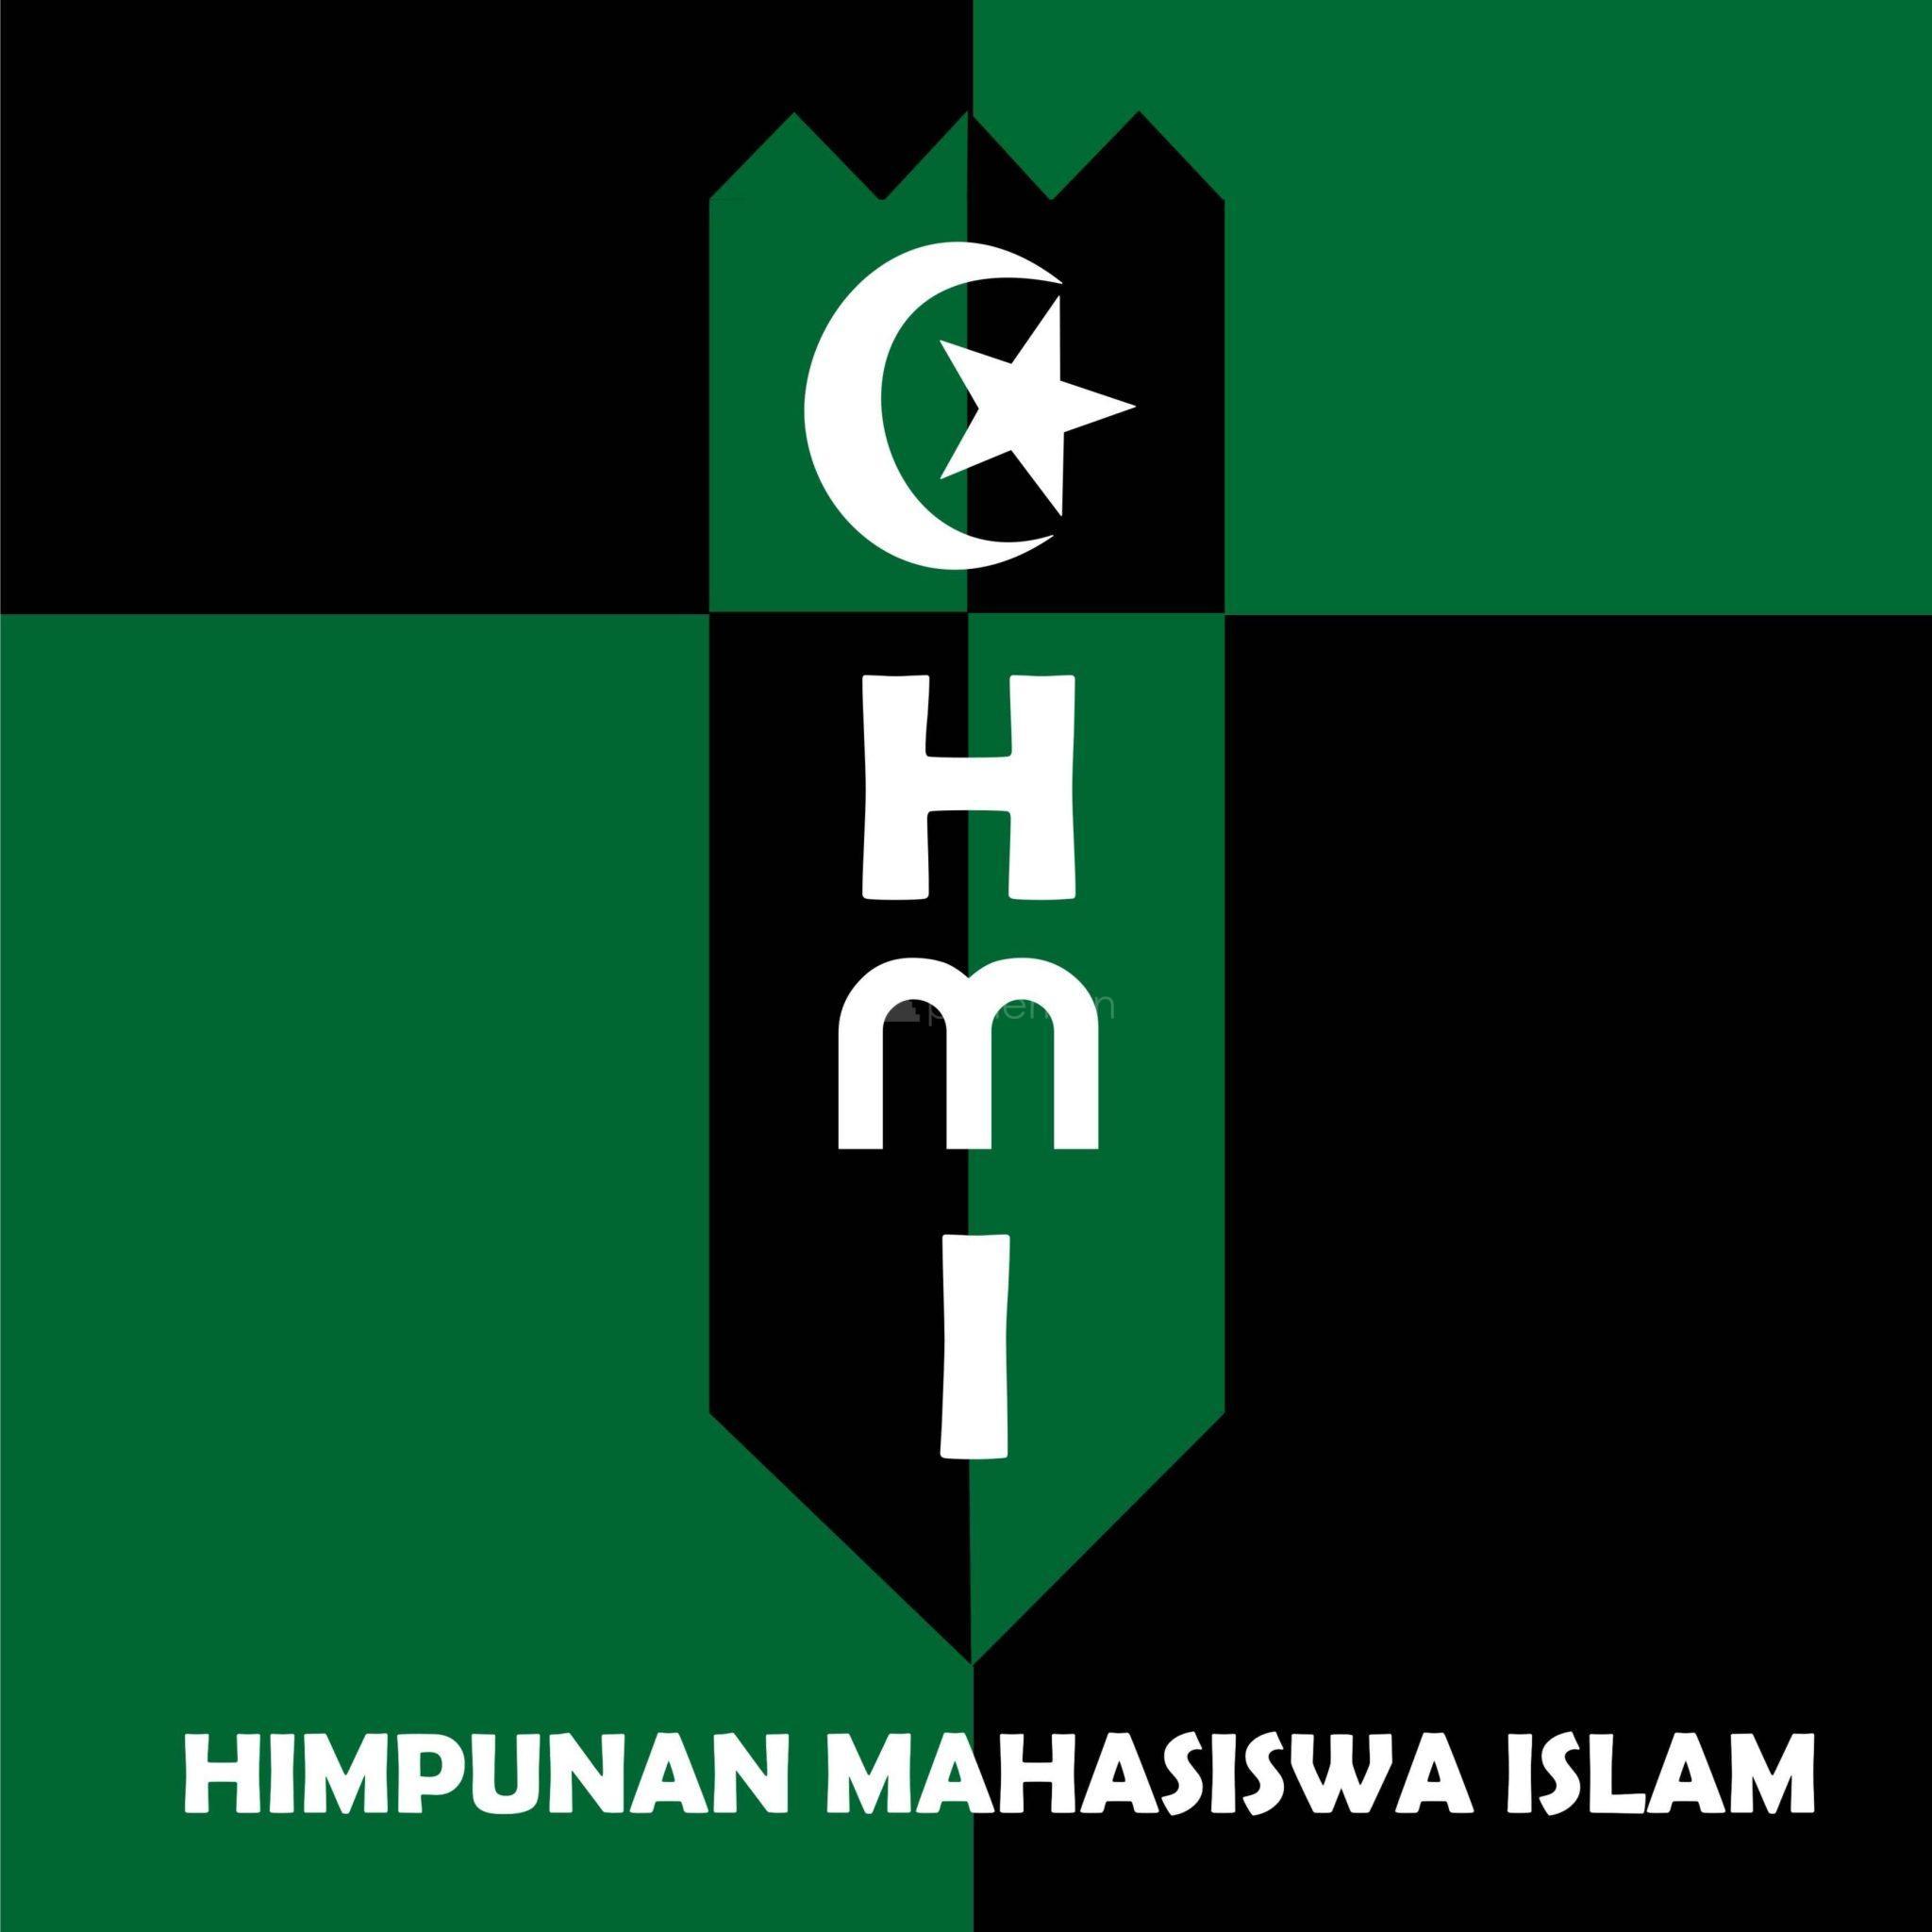 Jati Diri HMI-MPO